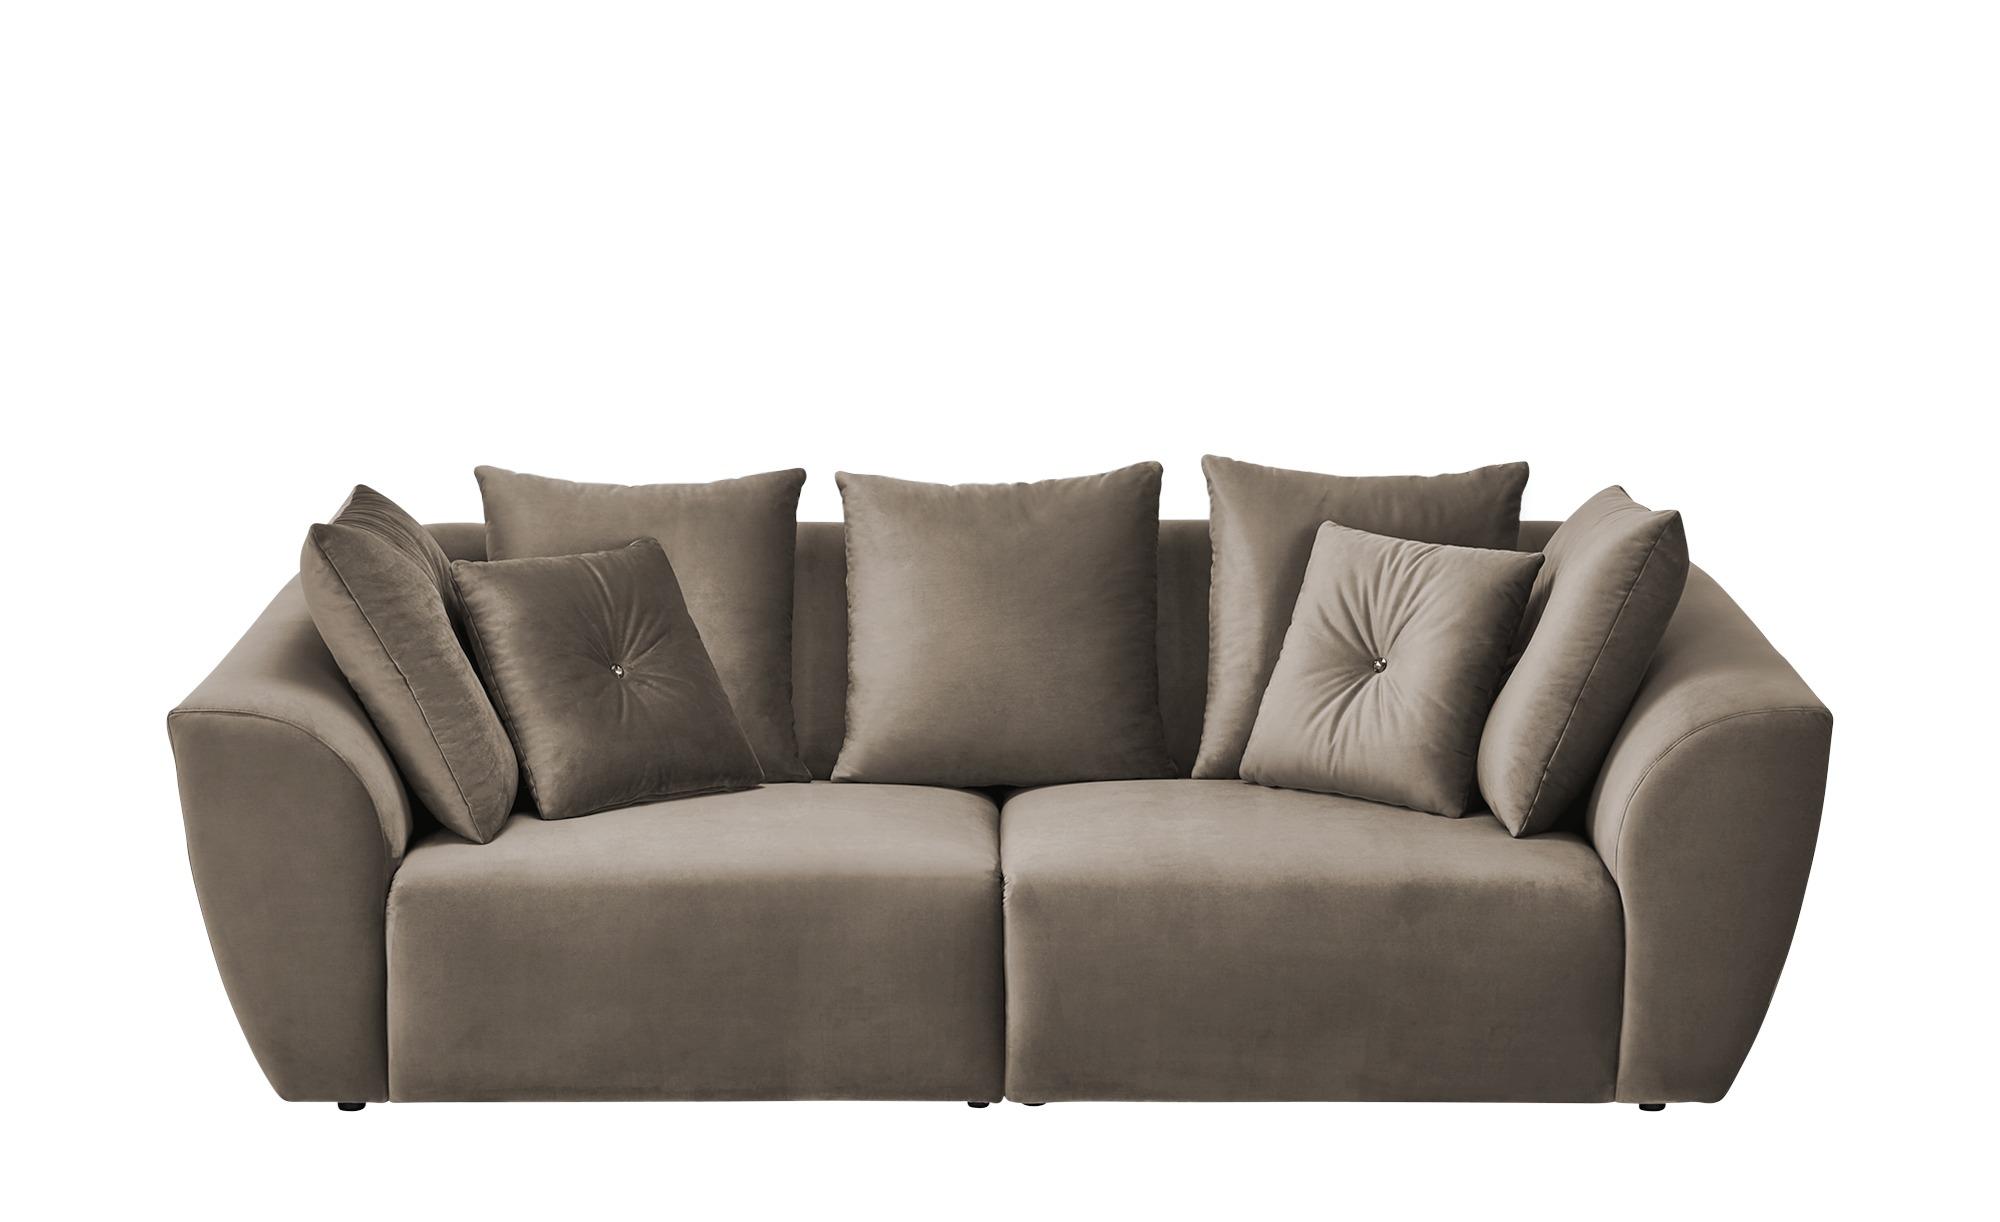 smart Big Sofa  Krista ¦ braun ¦ Maße (cm): B: 254 H: 92 T: 113 Polstermöbel > Sofas > Big-Sofas - Höffner